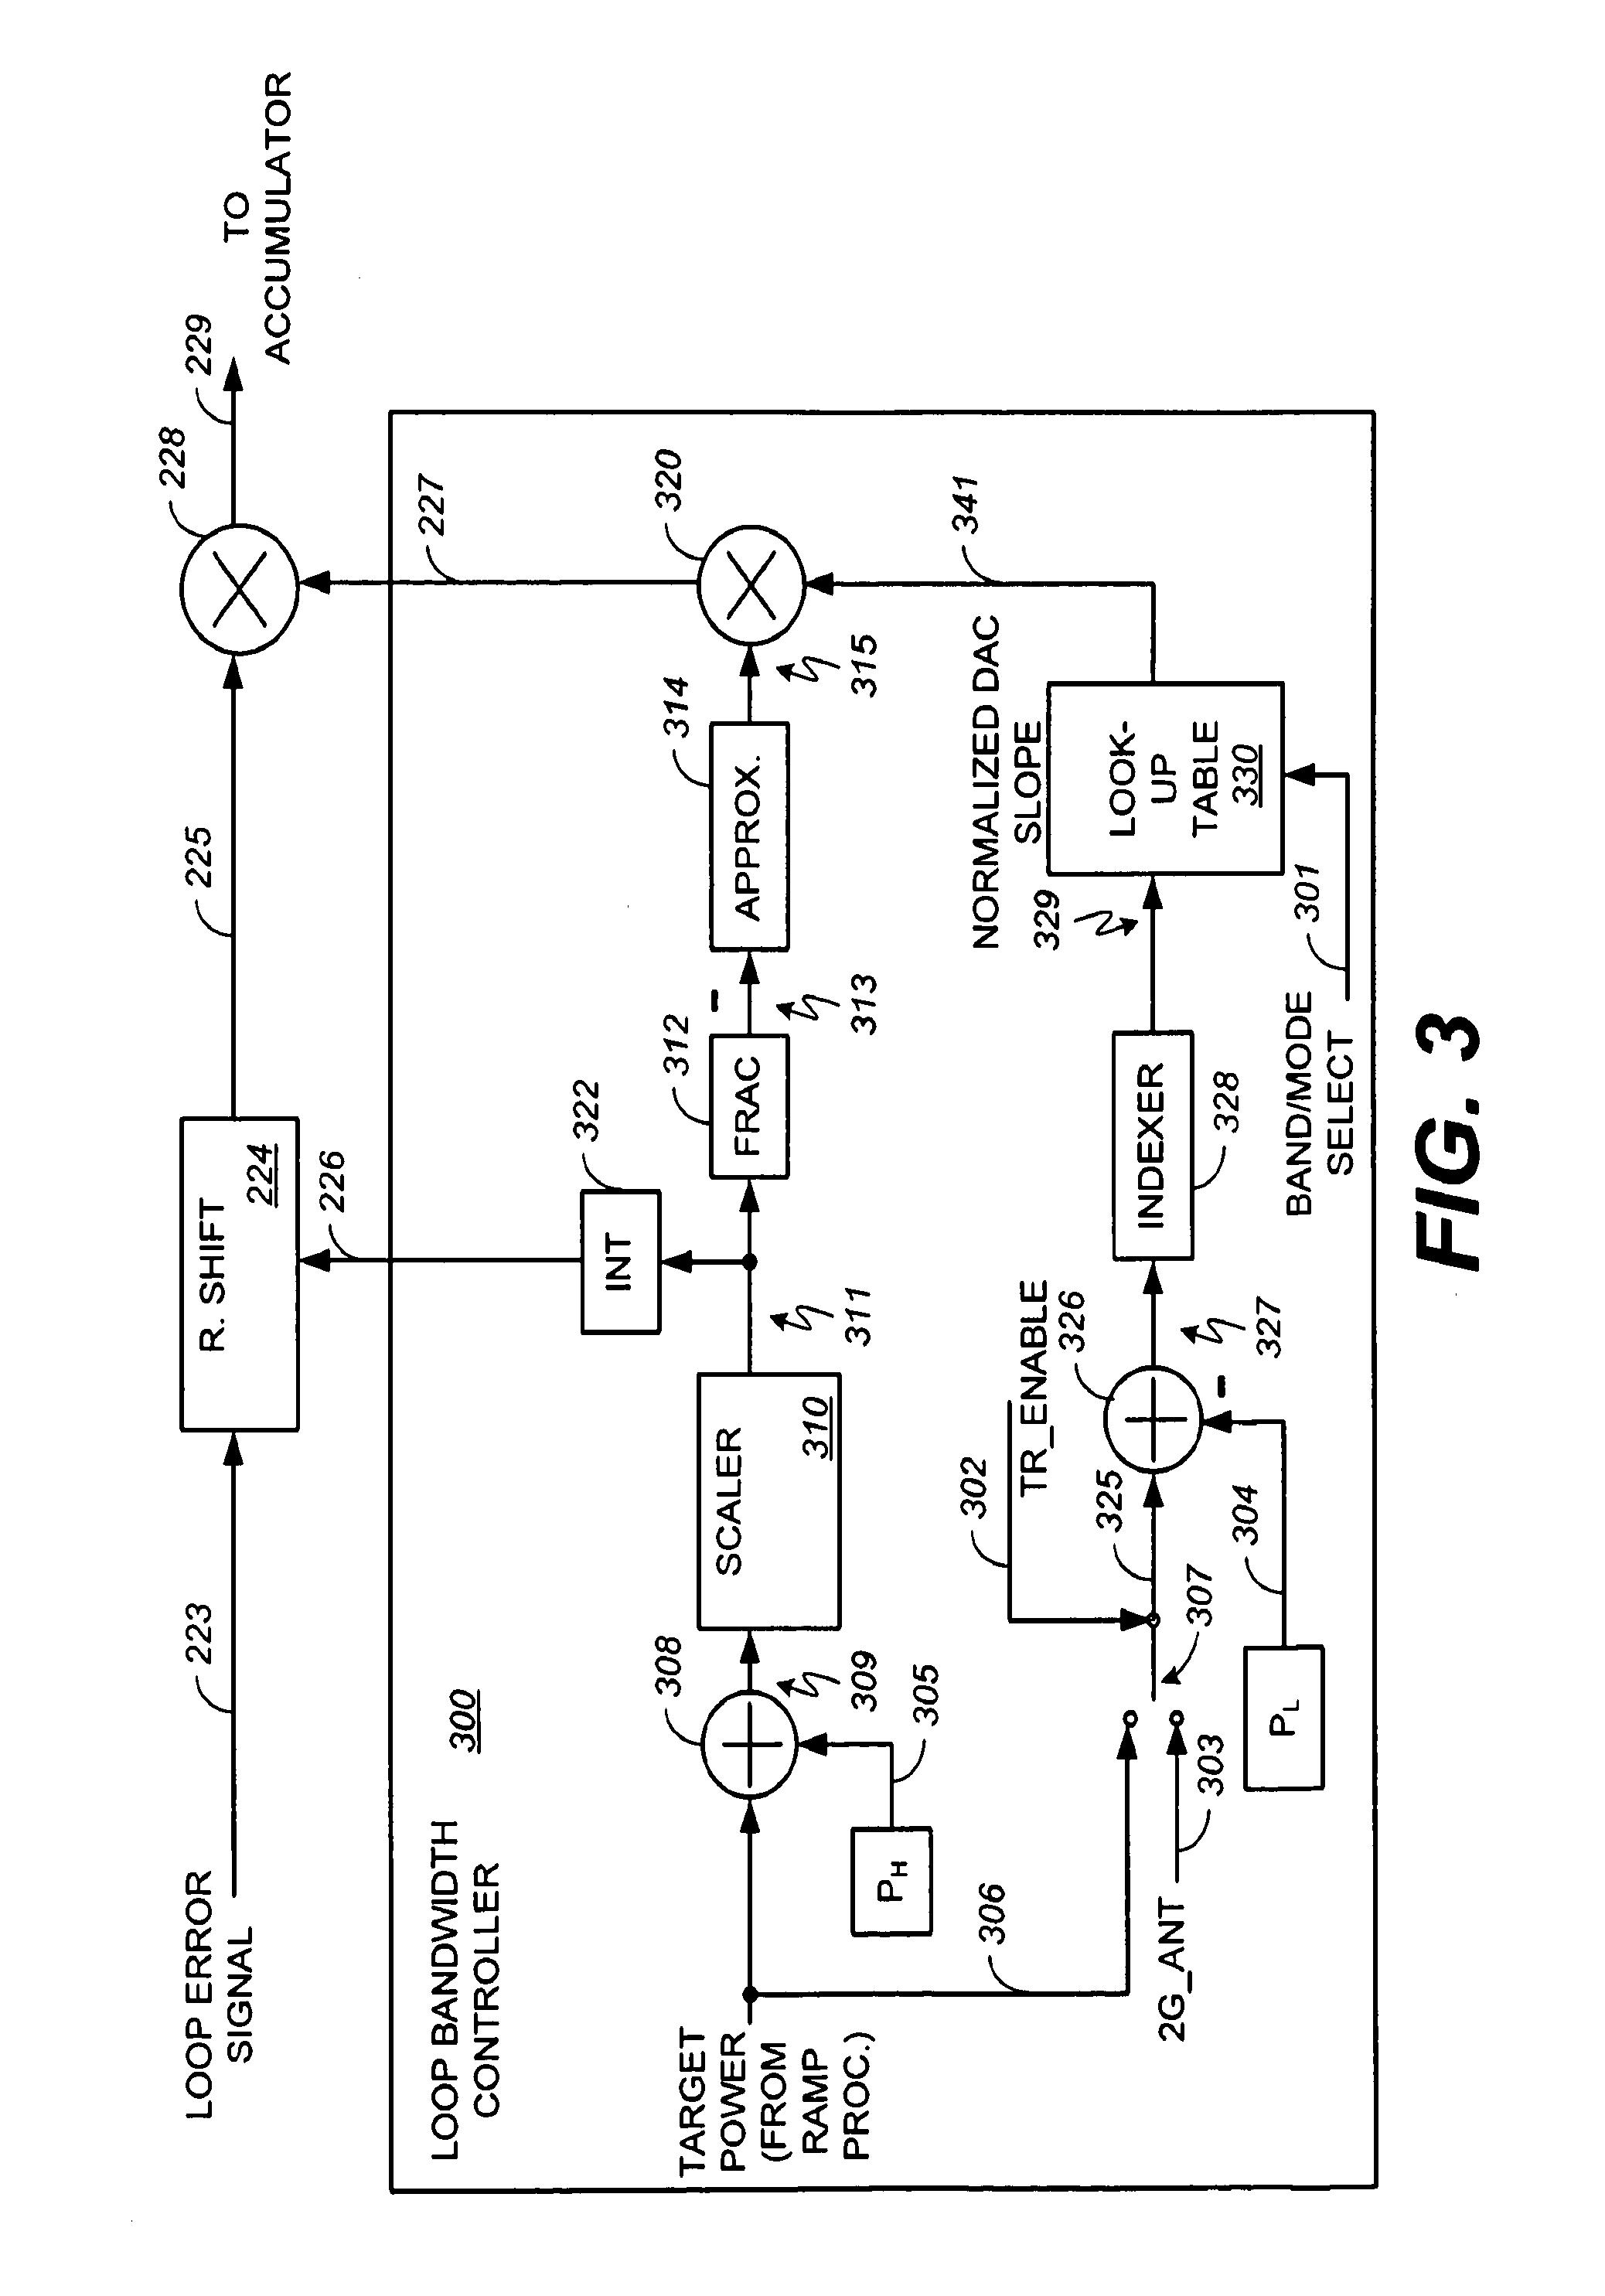 Patente Us8606311 Closed Loop Adaptive Power Control For Adjusting Zero Crossing Detector Using Ic 311 Patent Drawing